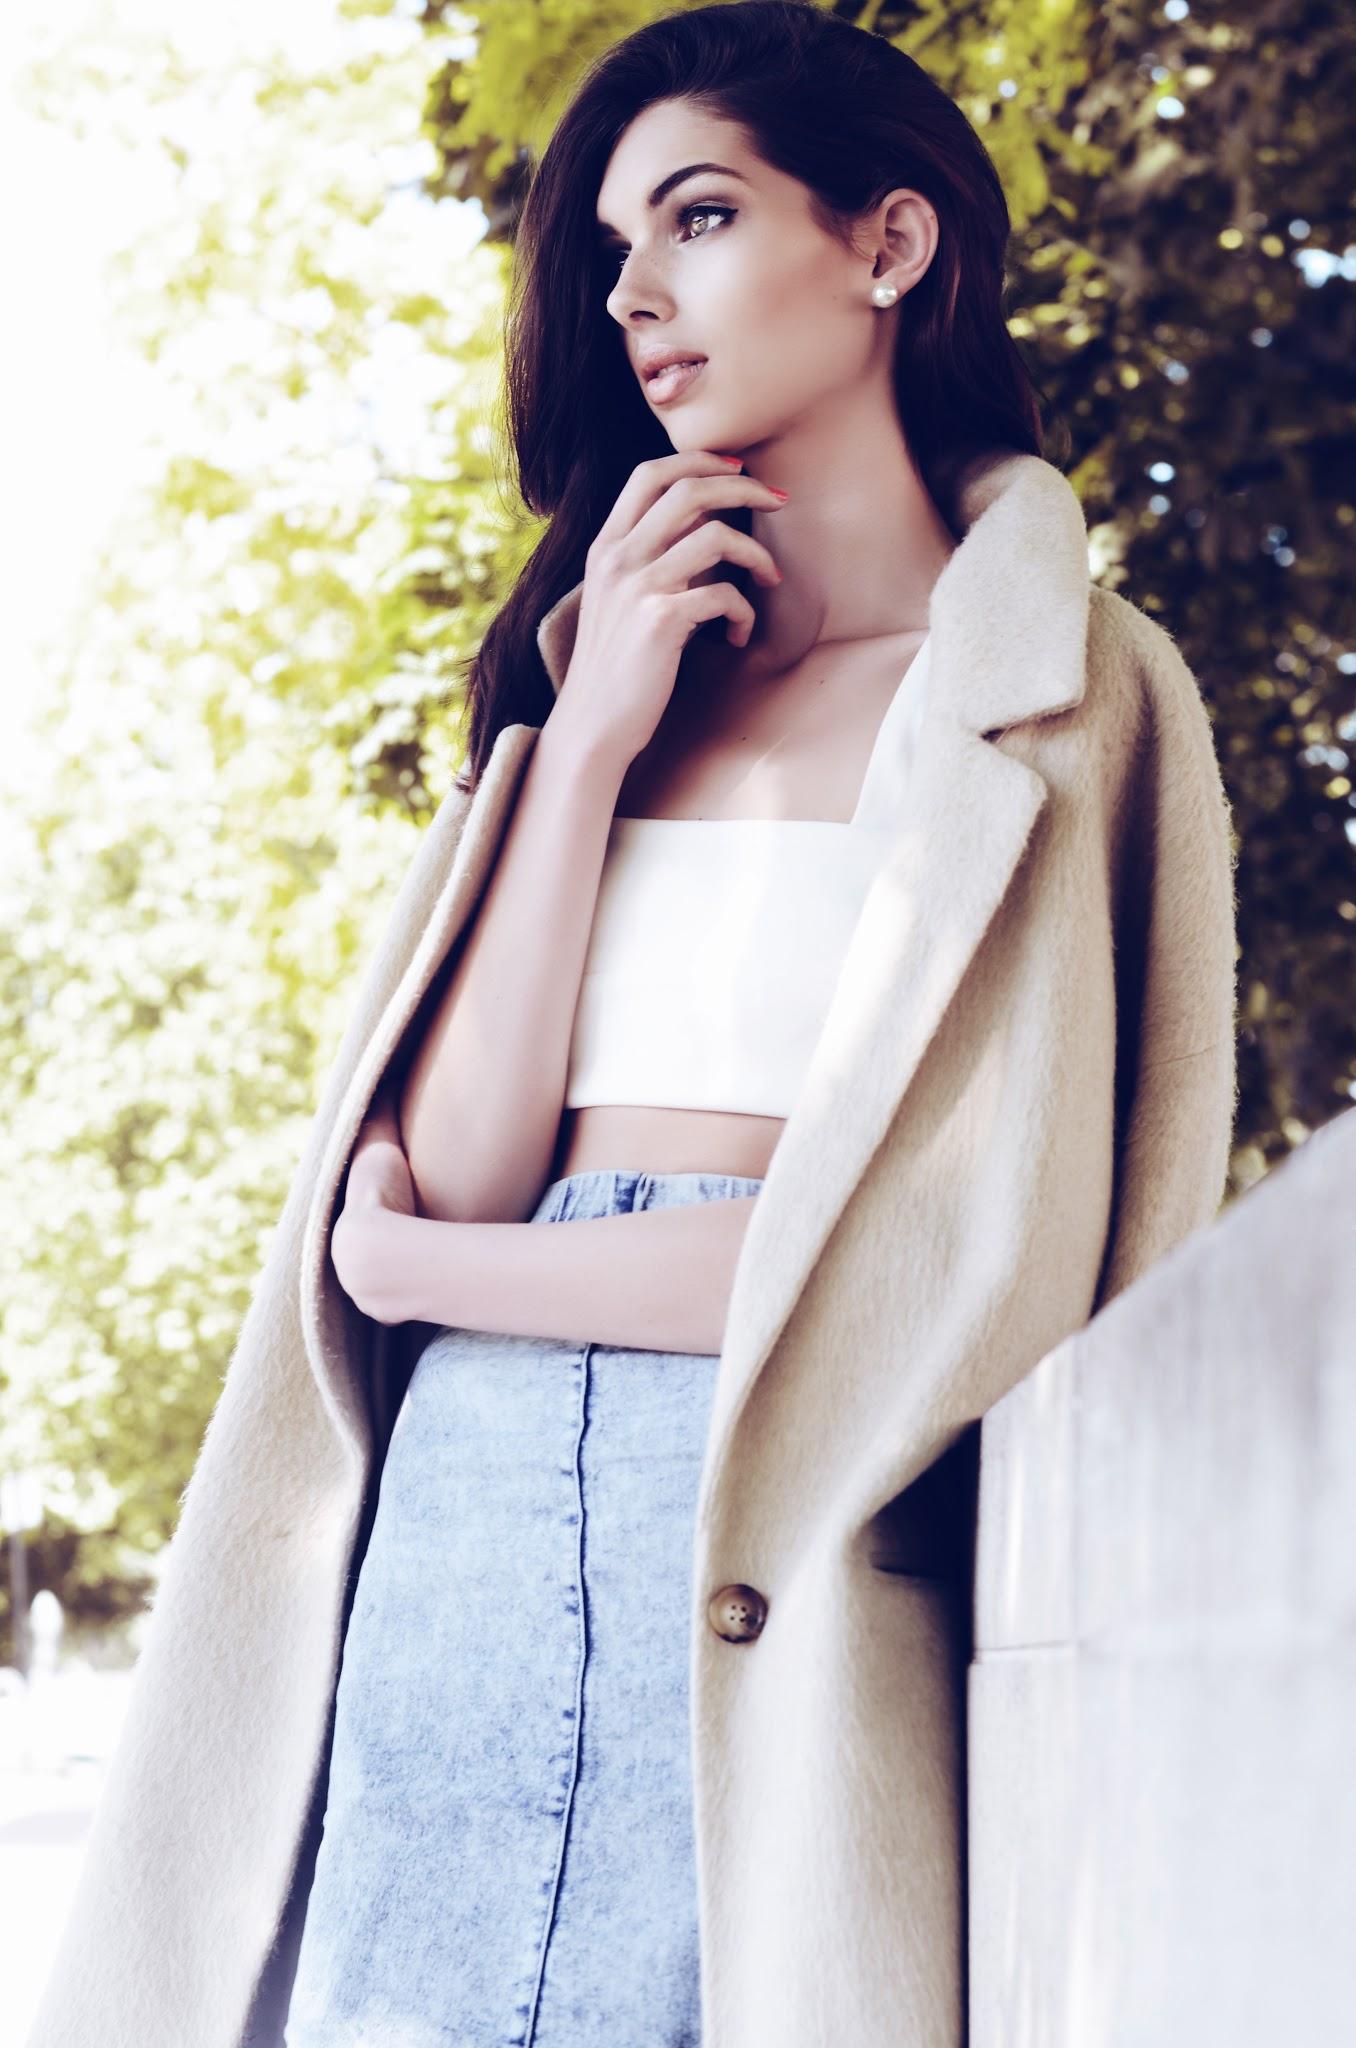 topshop primark street style fashion editorial